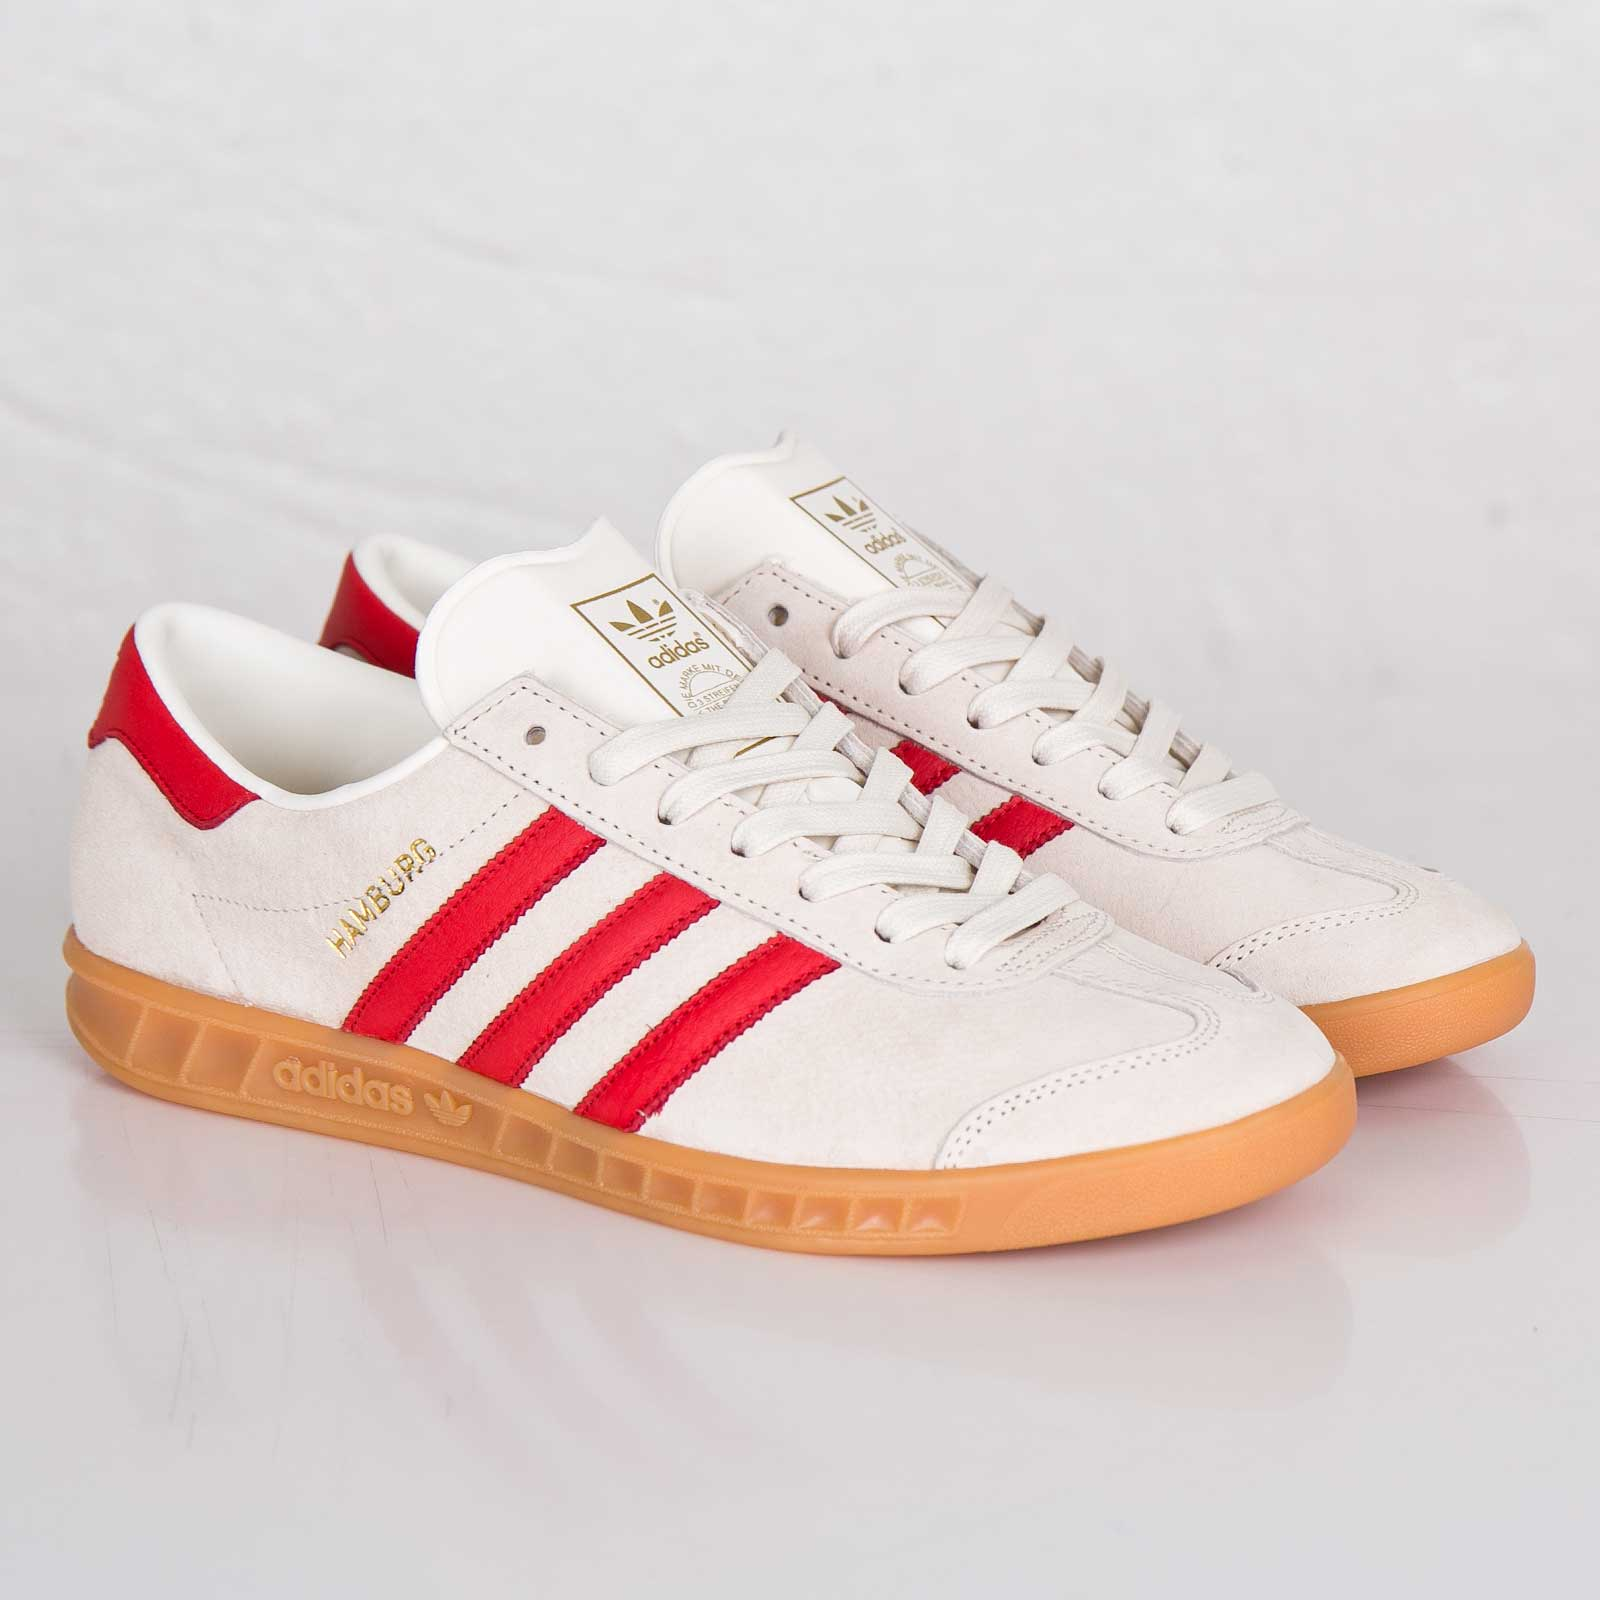 adidas Hamburg - M17870 - SNS   sneakers & streetwear online since ...